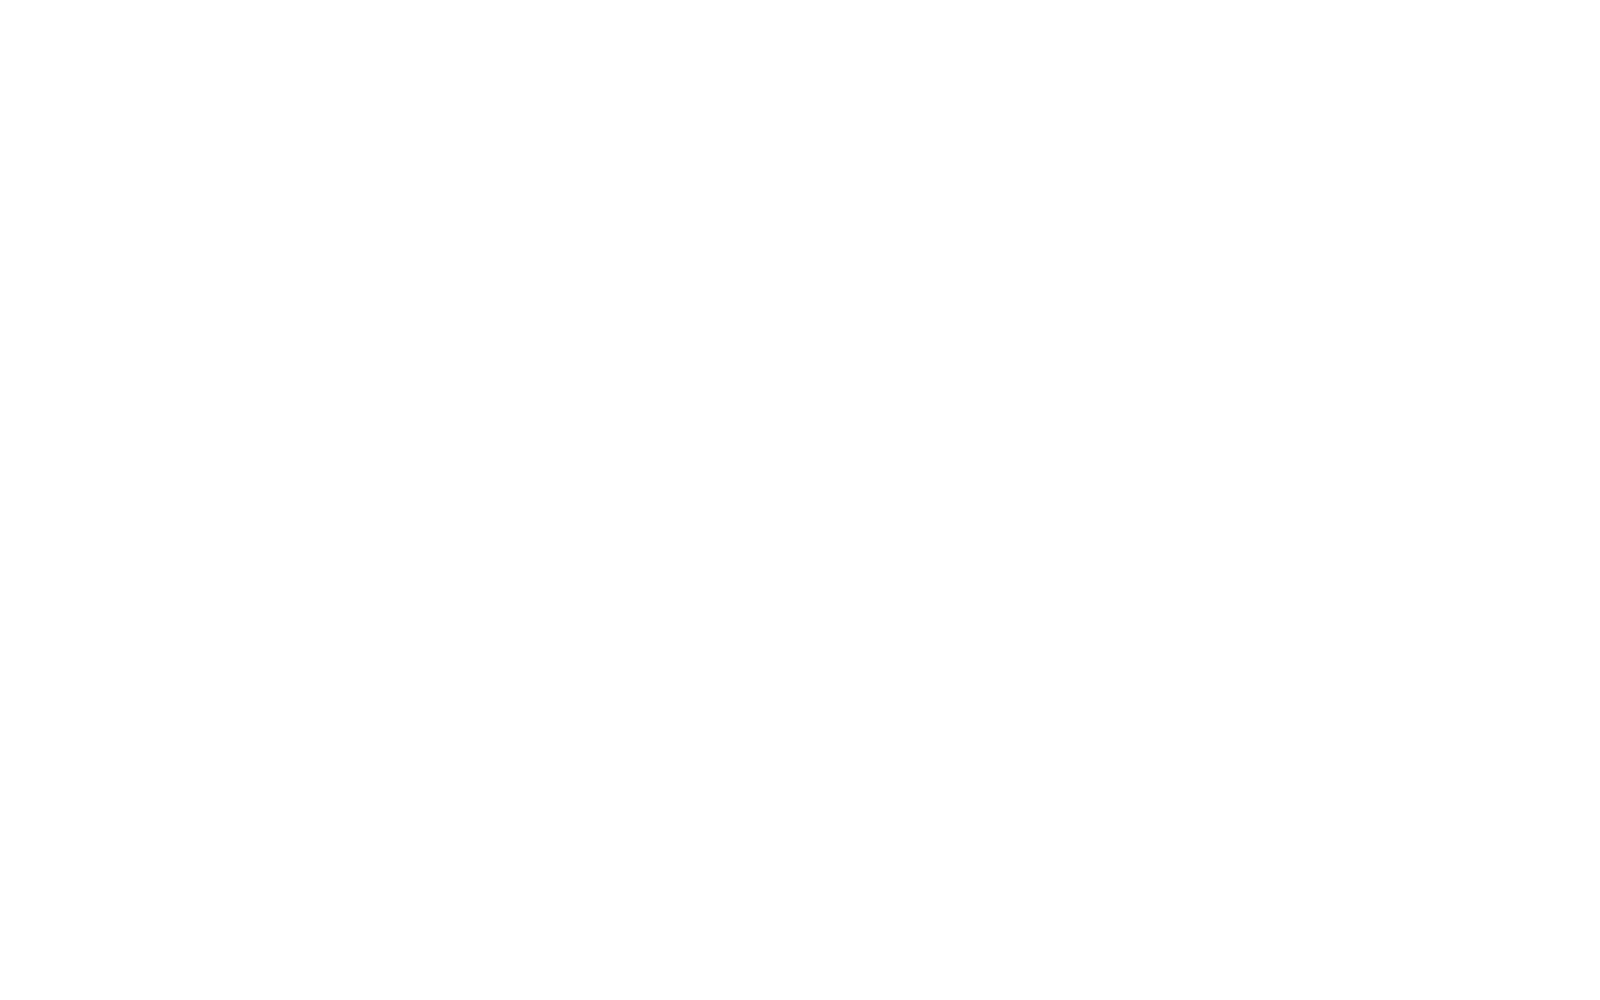 Magnifique et sulfureuse Catrinel Menghia